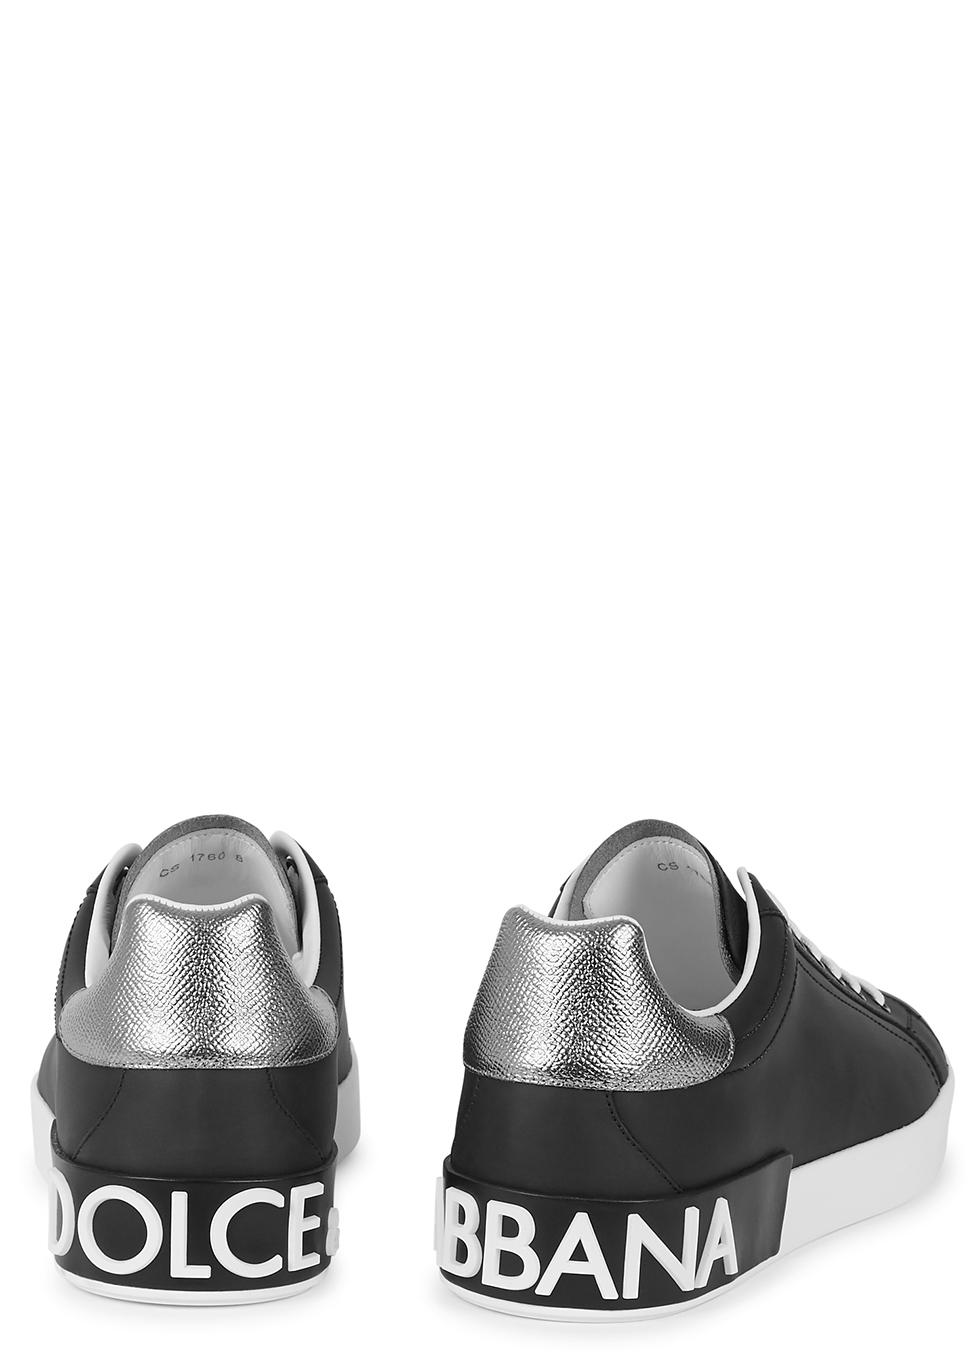 Dolce & Gabbana Portofino black leather